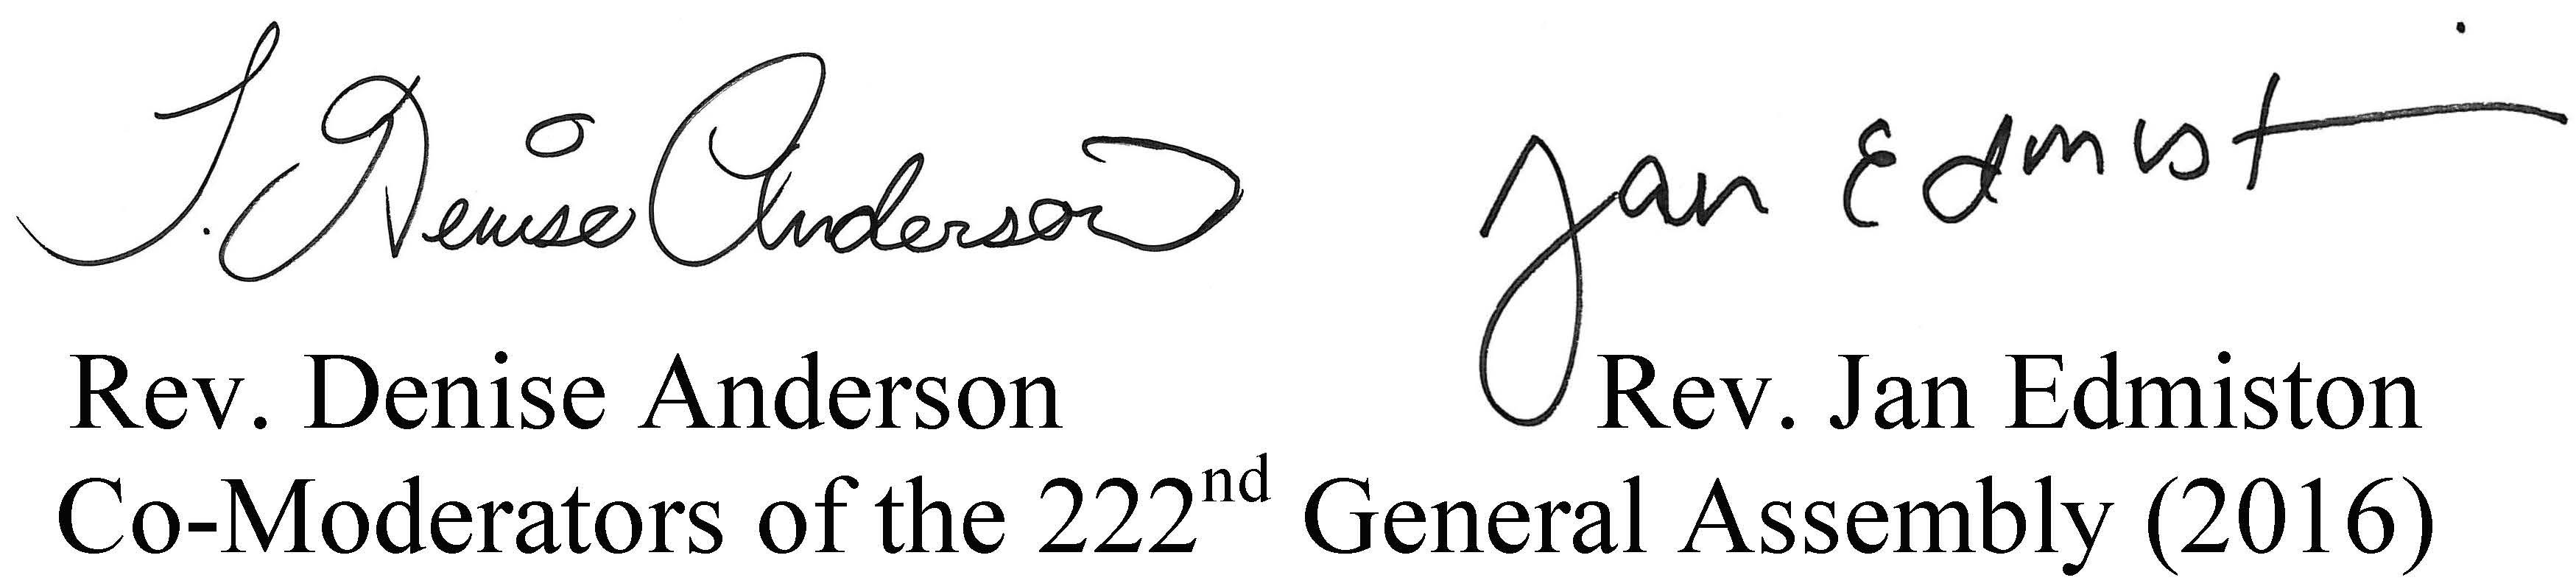 CoModerator Signatures